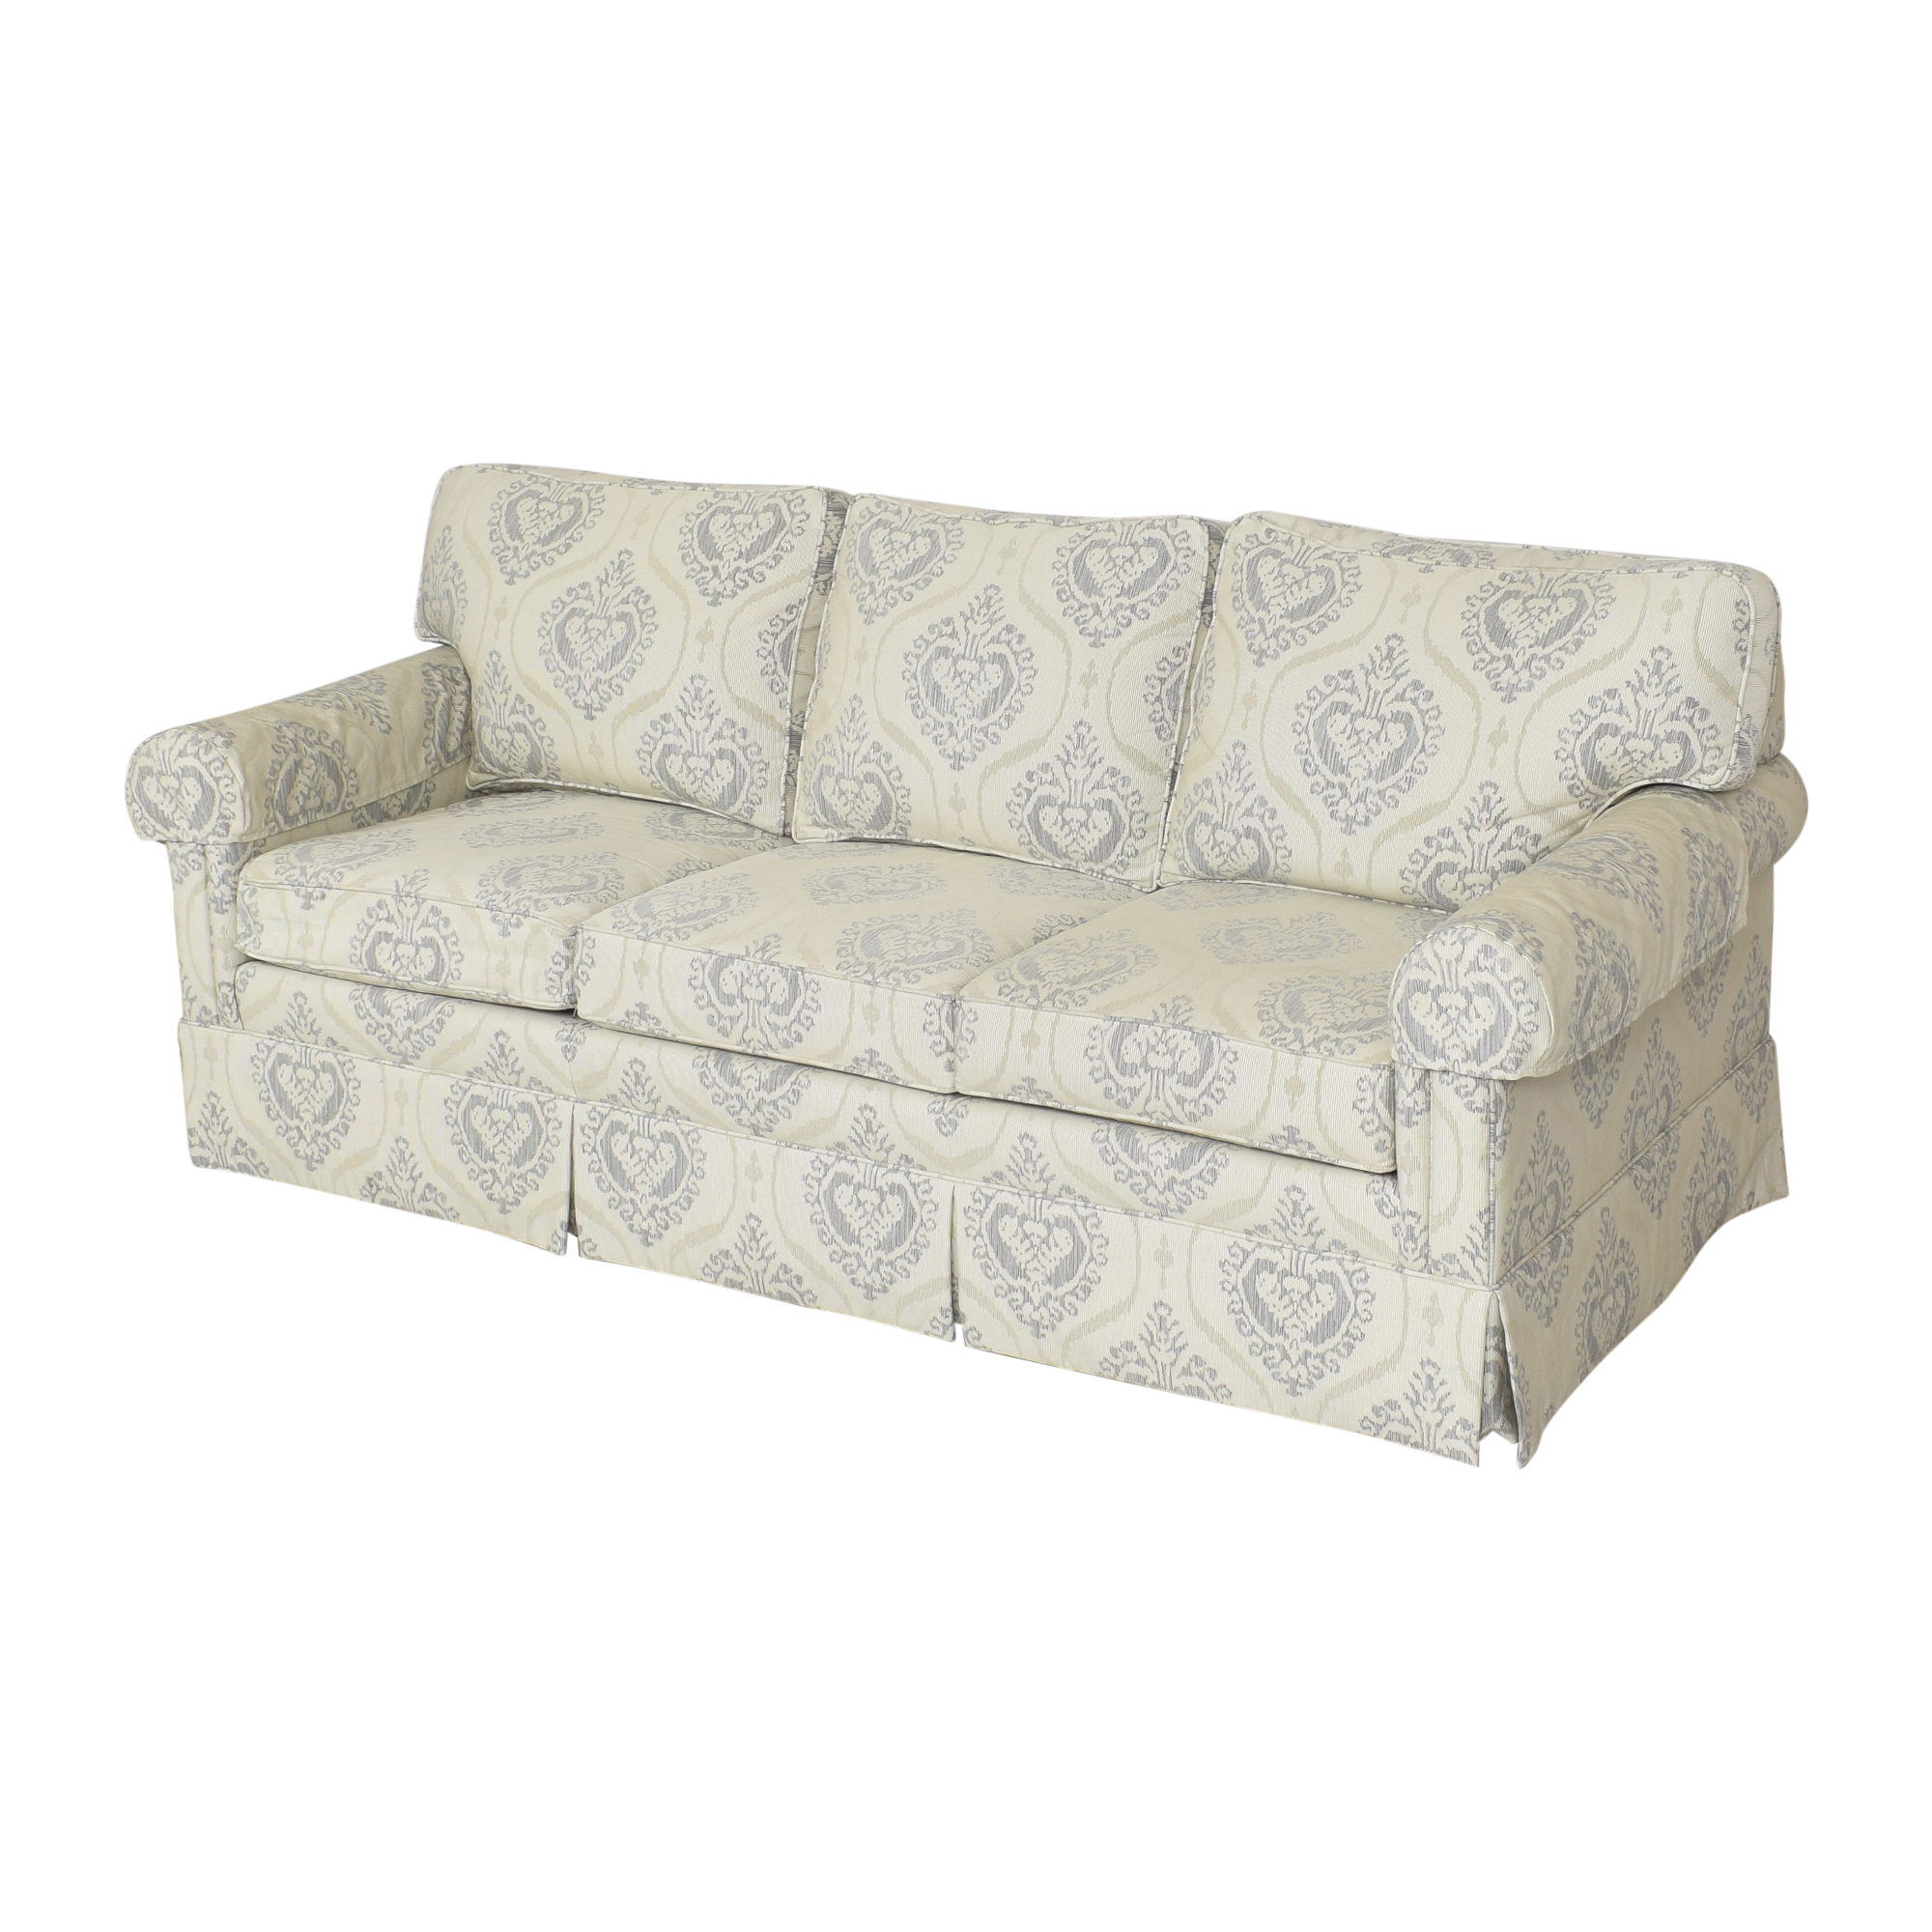 buy Ethan Allen Ethan Allen Three Cushion Skirted Sofa online